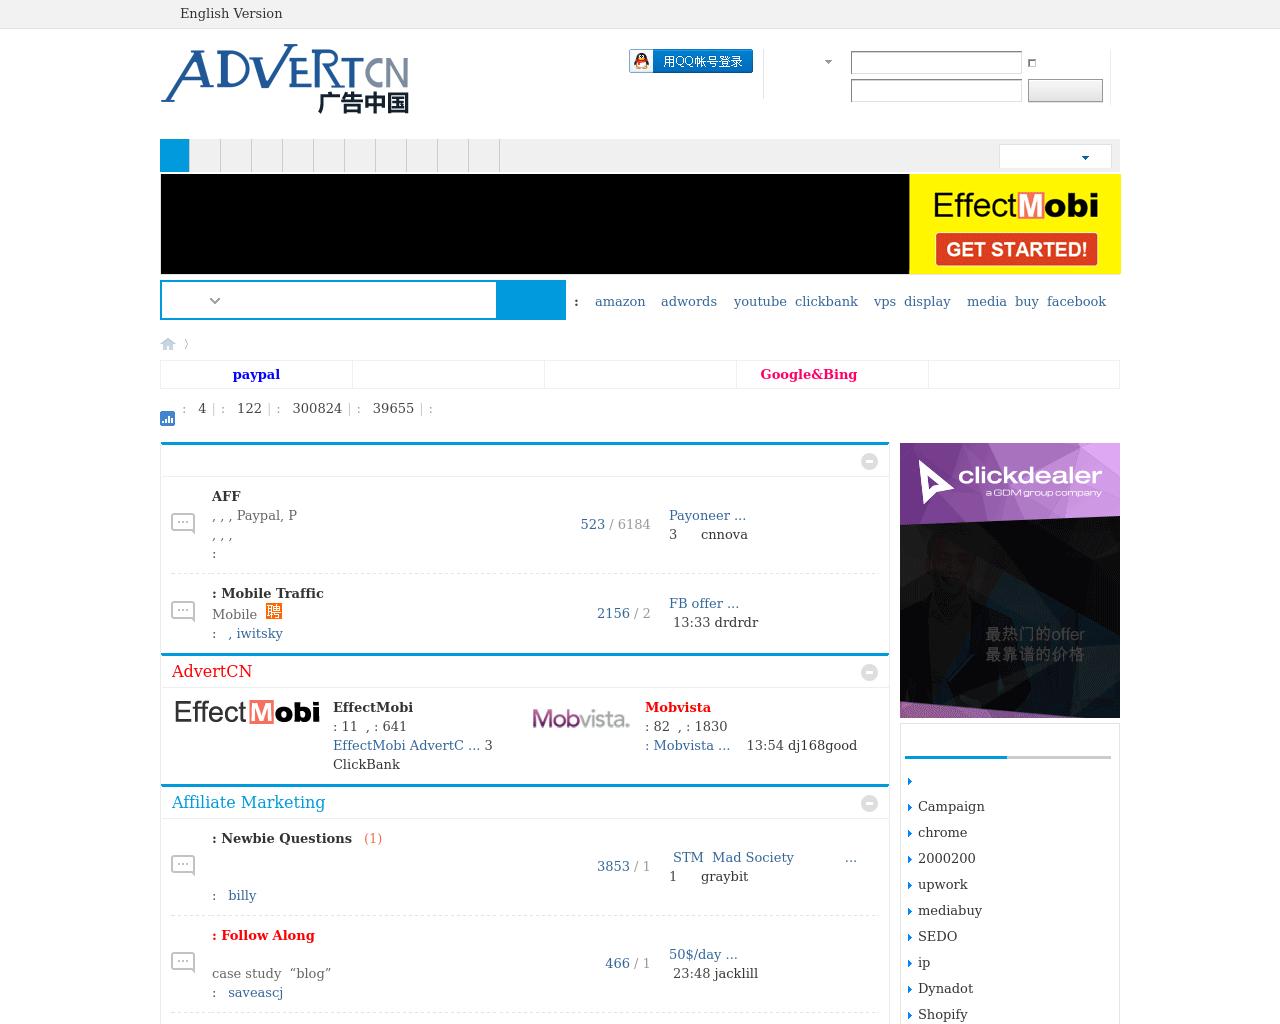 ADVERT-CN-Advertising-Reviews-Pricing